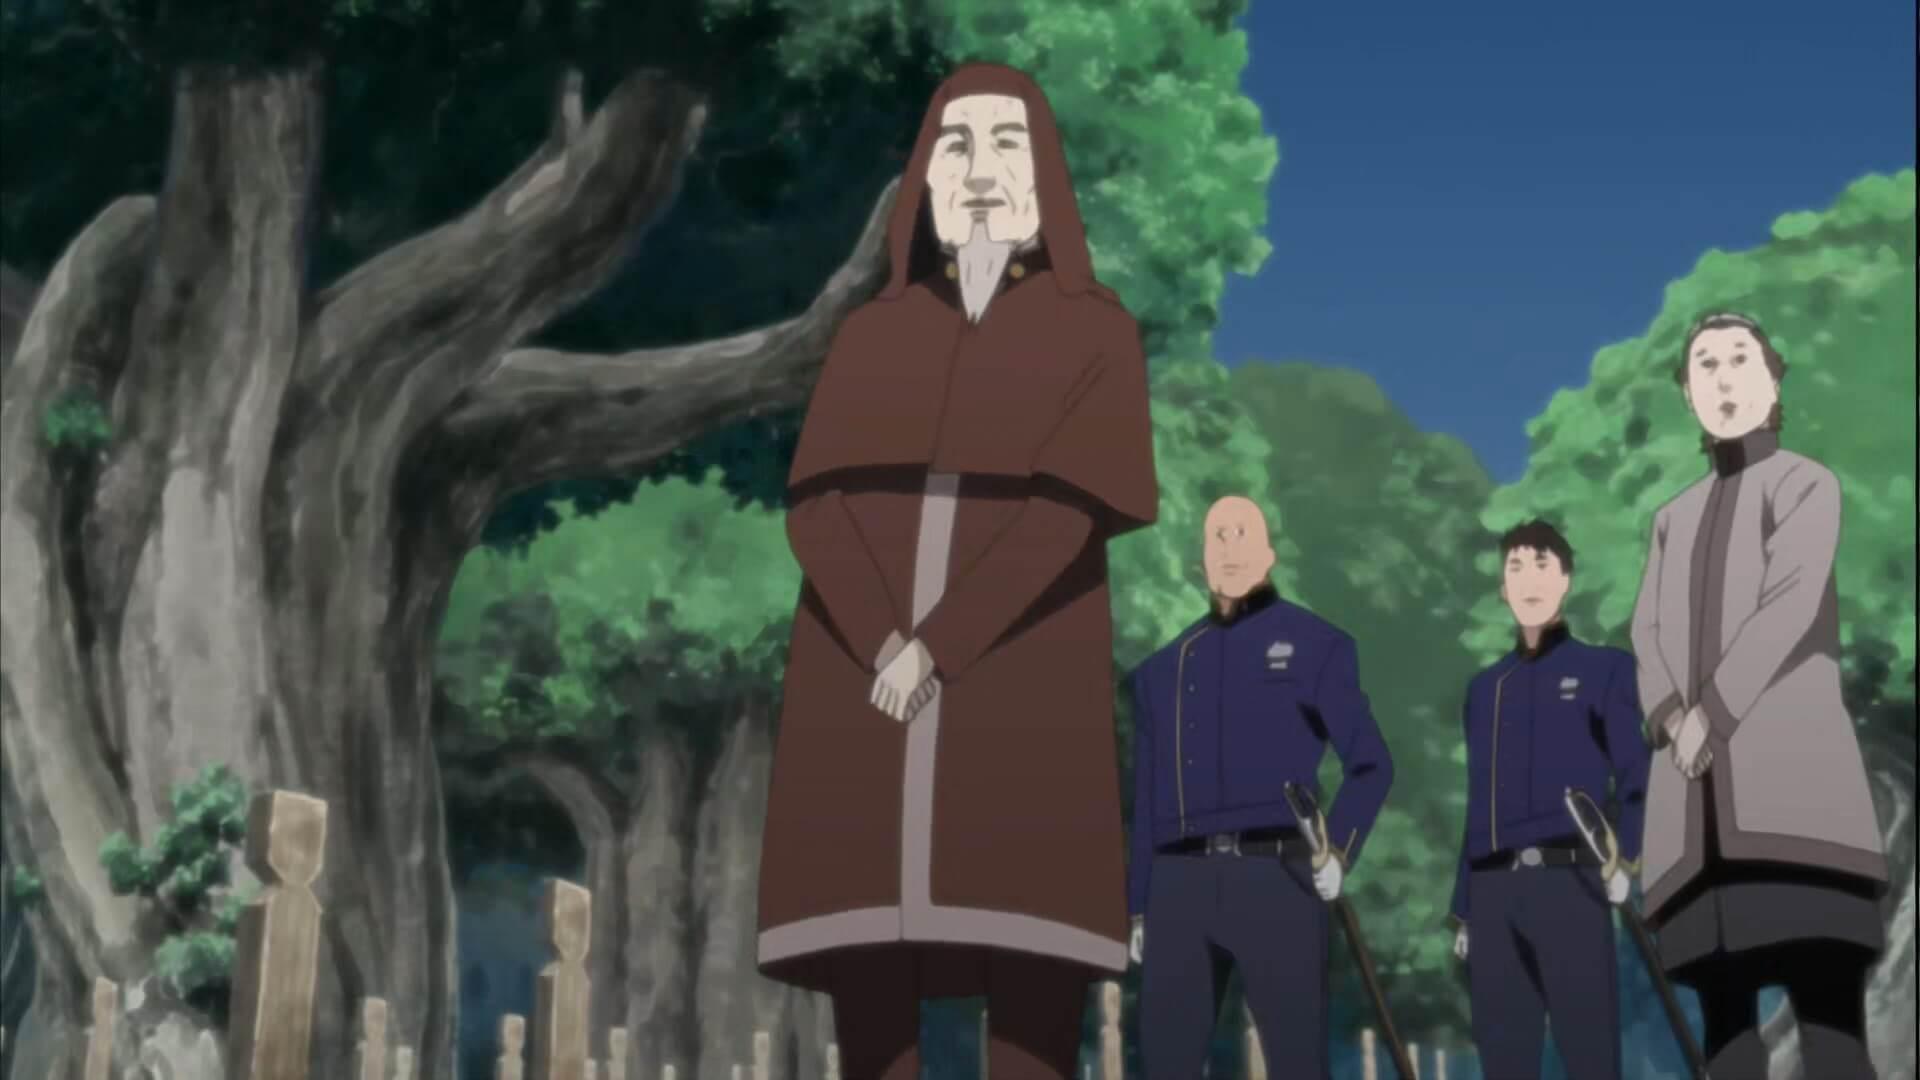 Naruto Shippuden Episode 9 Vostfr - Fandemanga